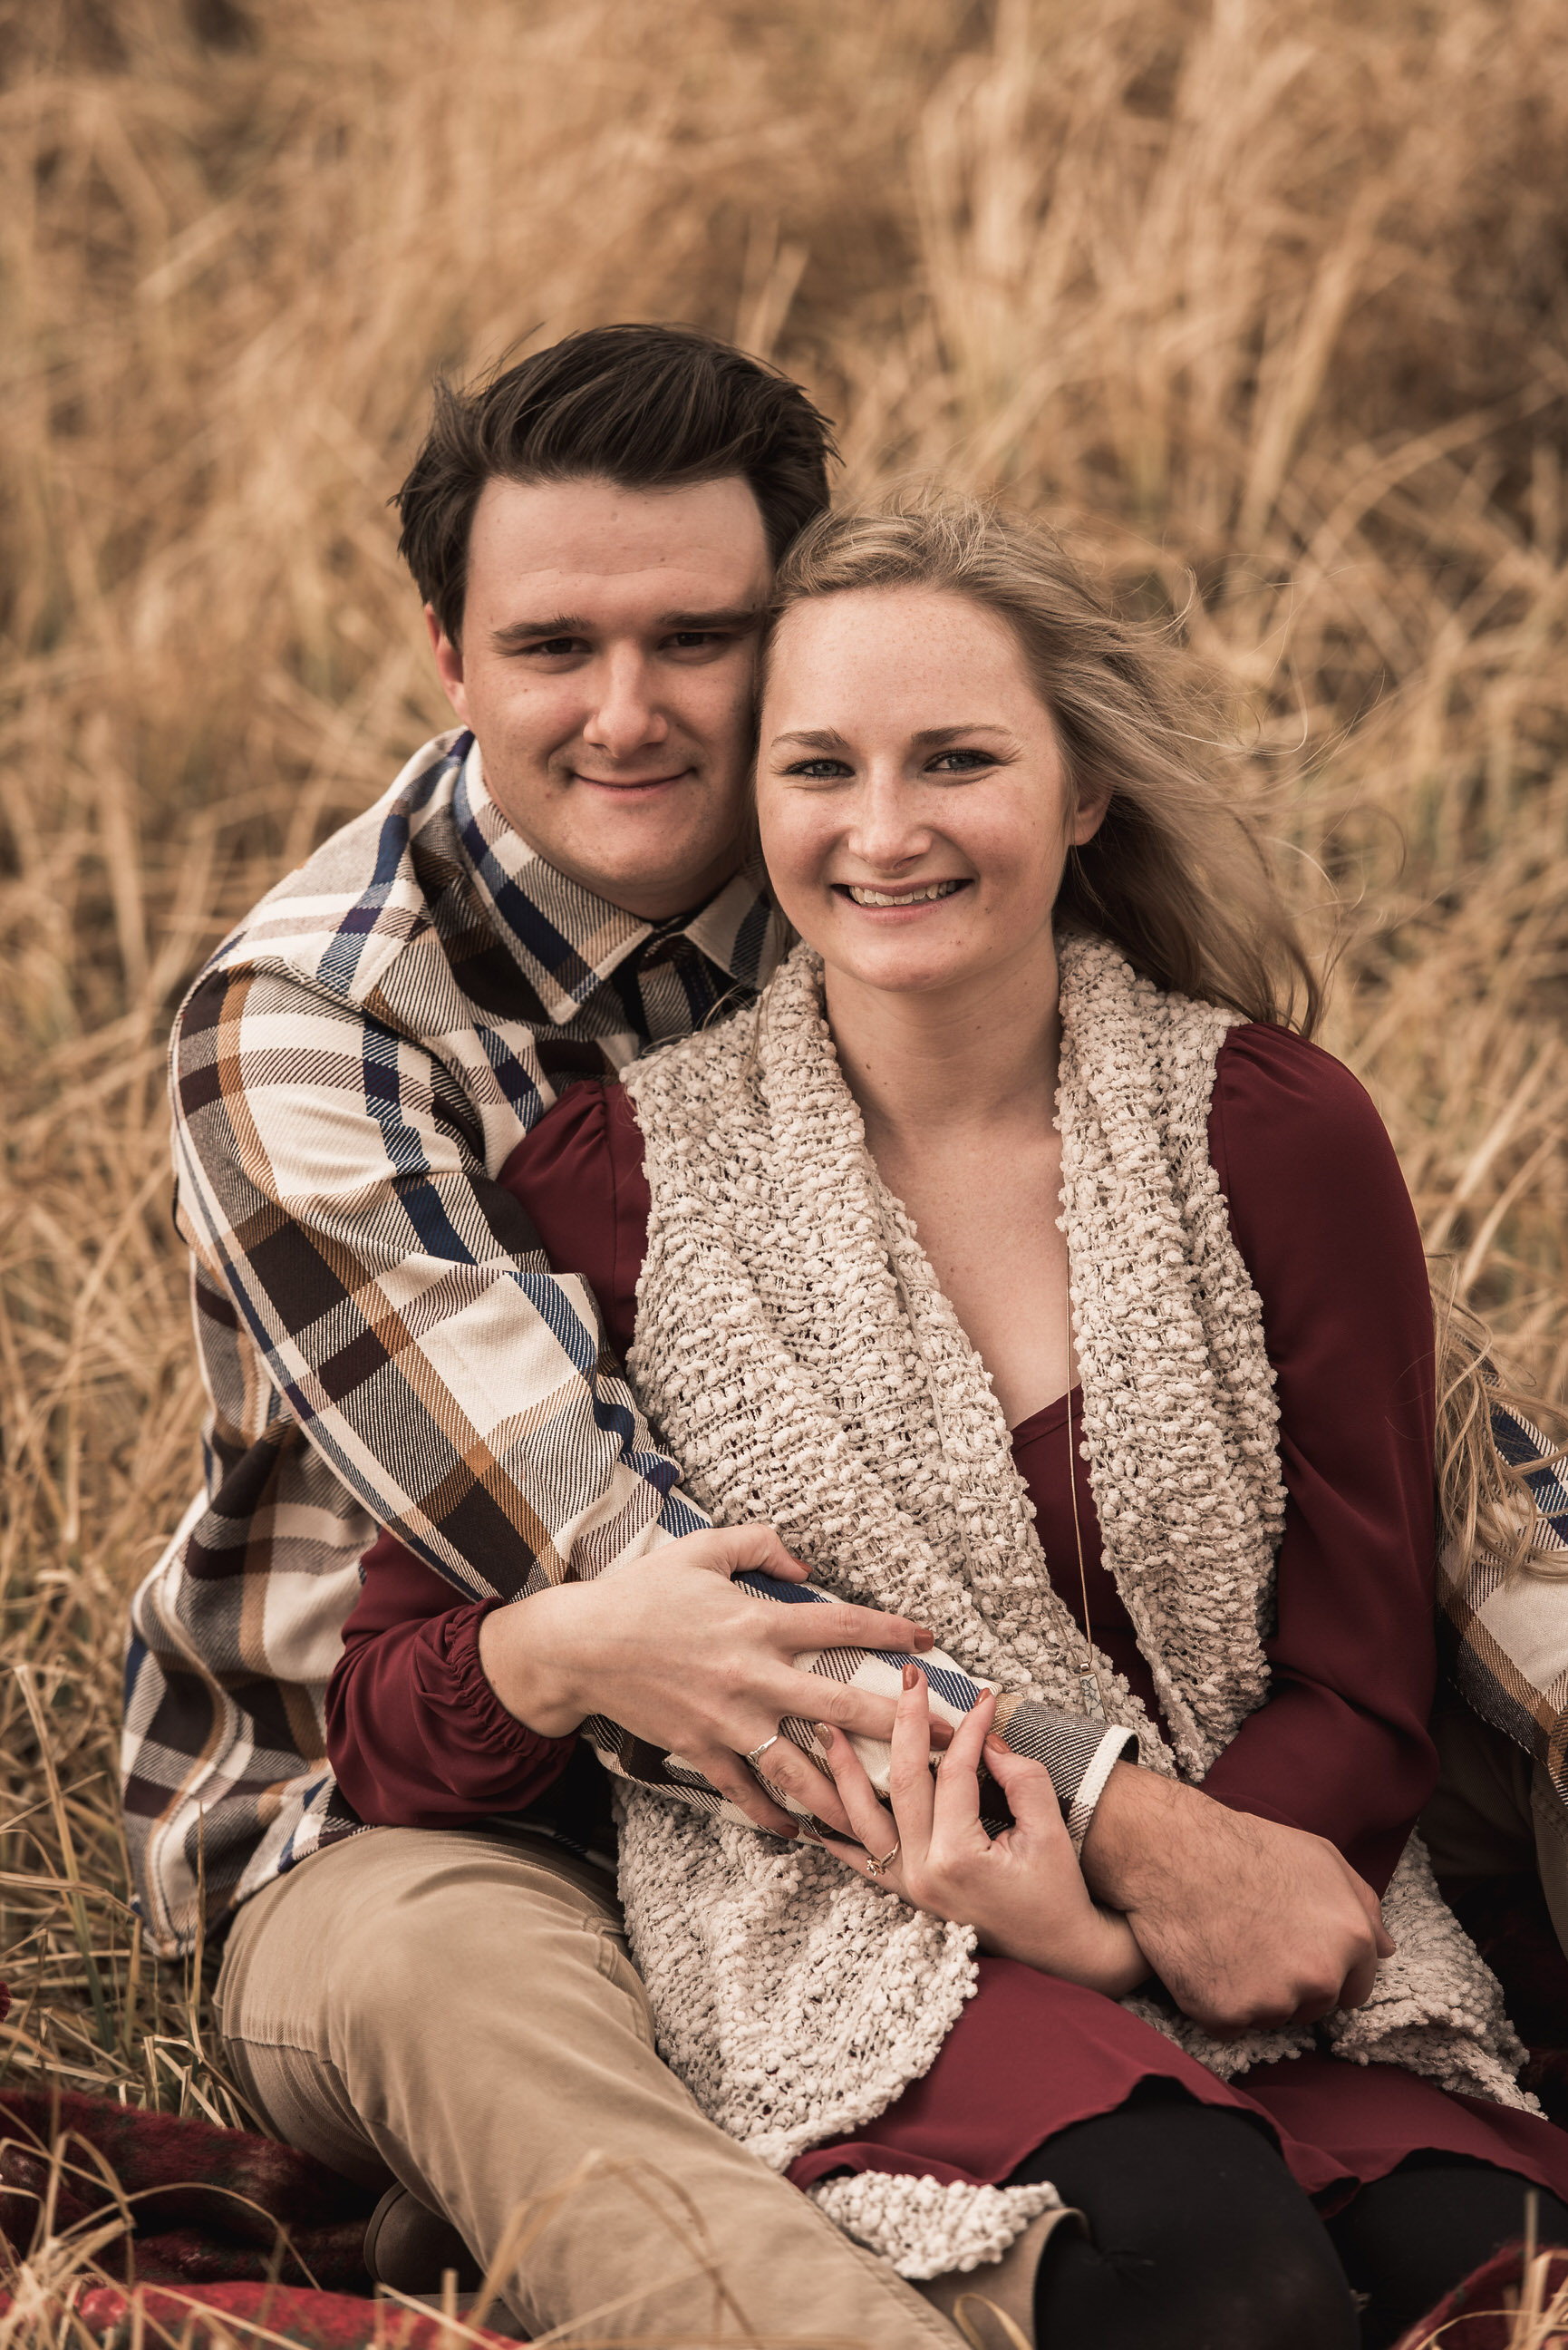 summit county engagement wedding photography boulder